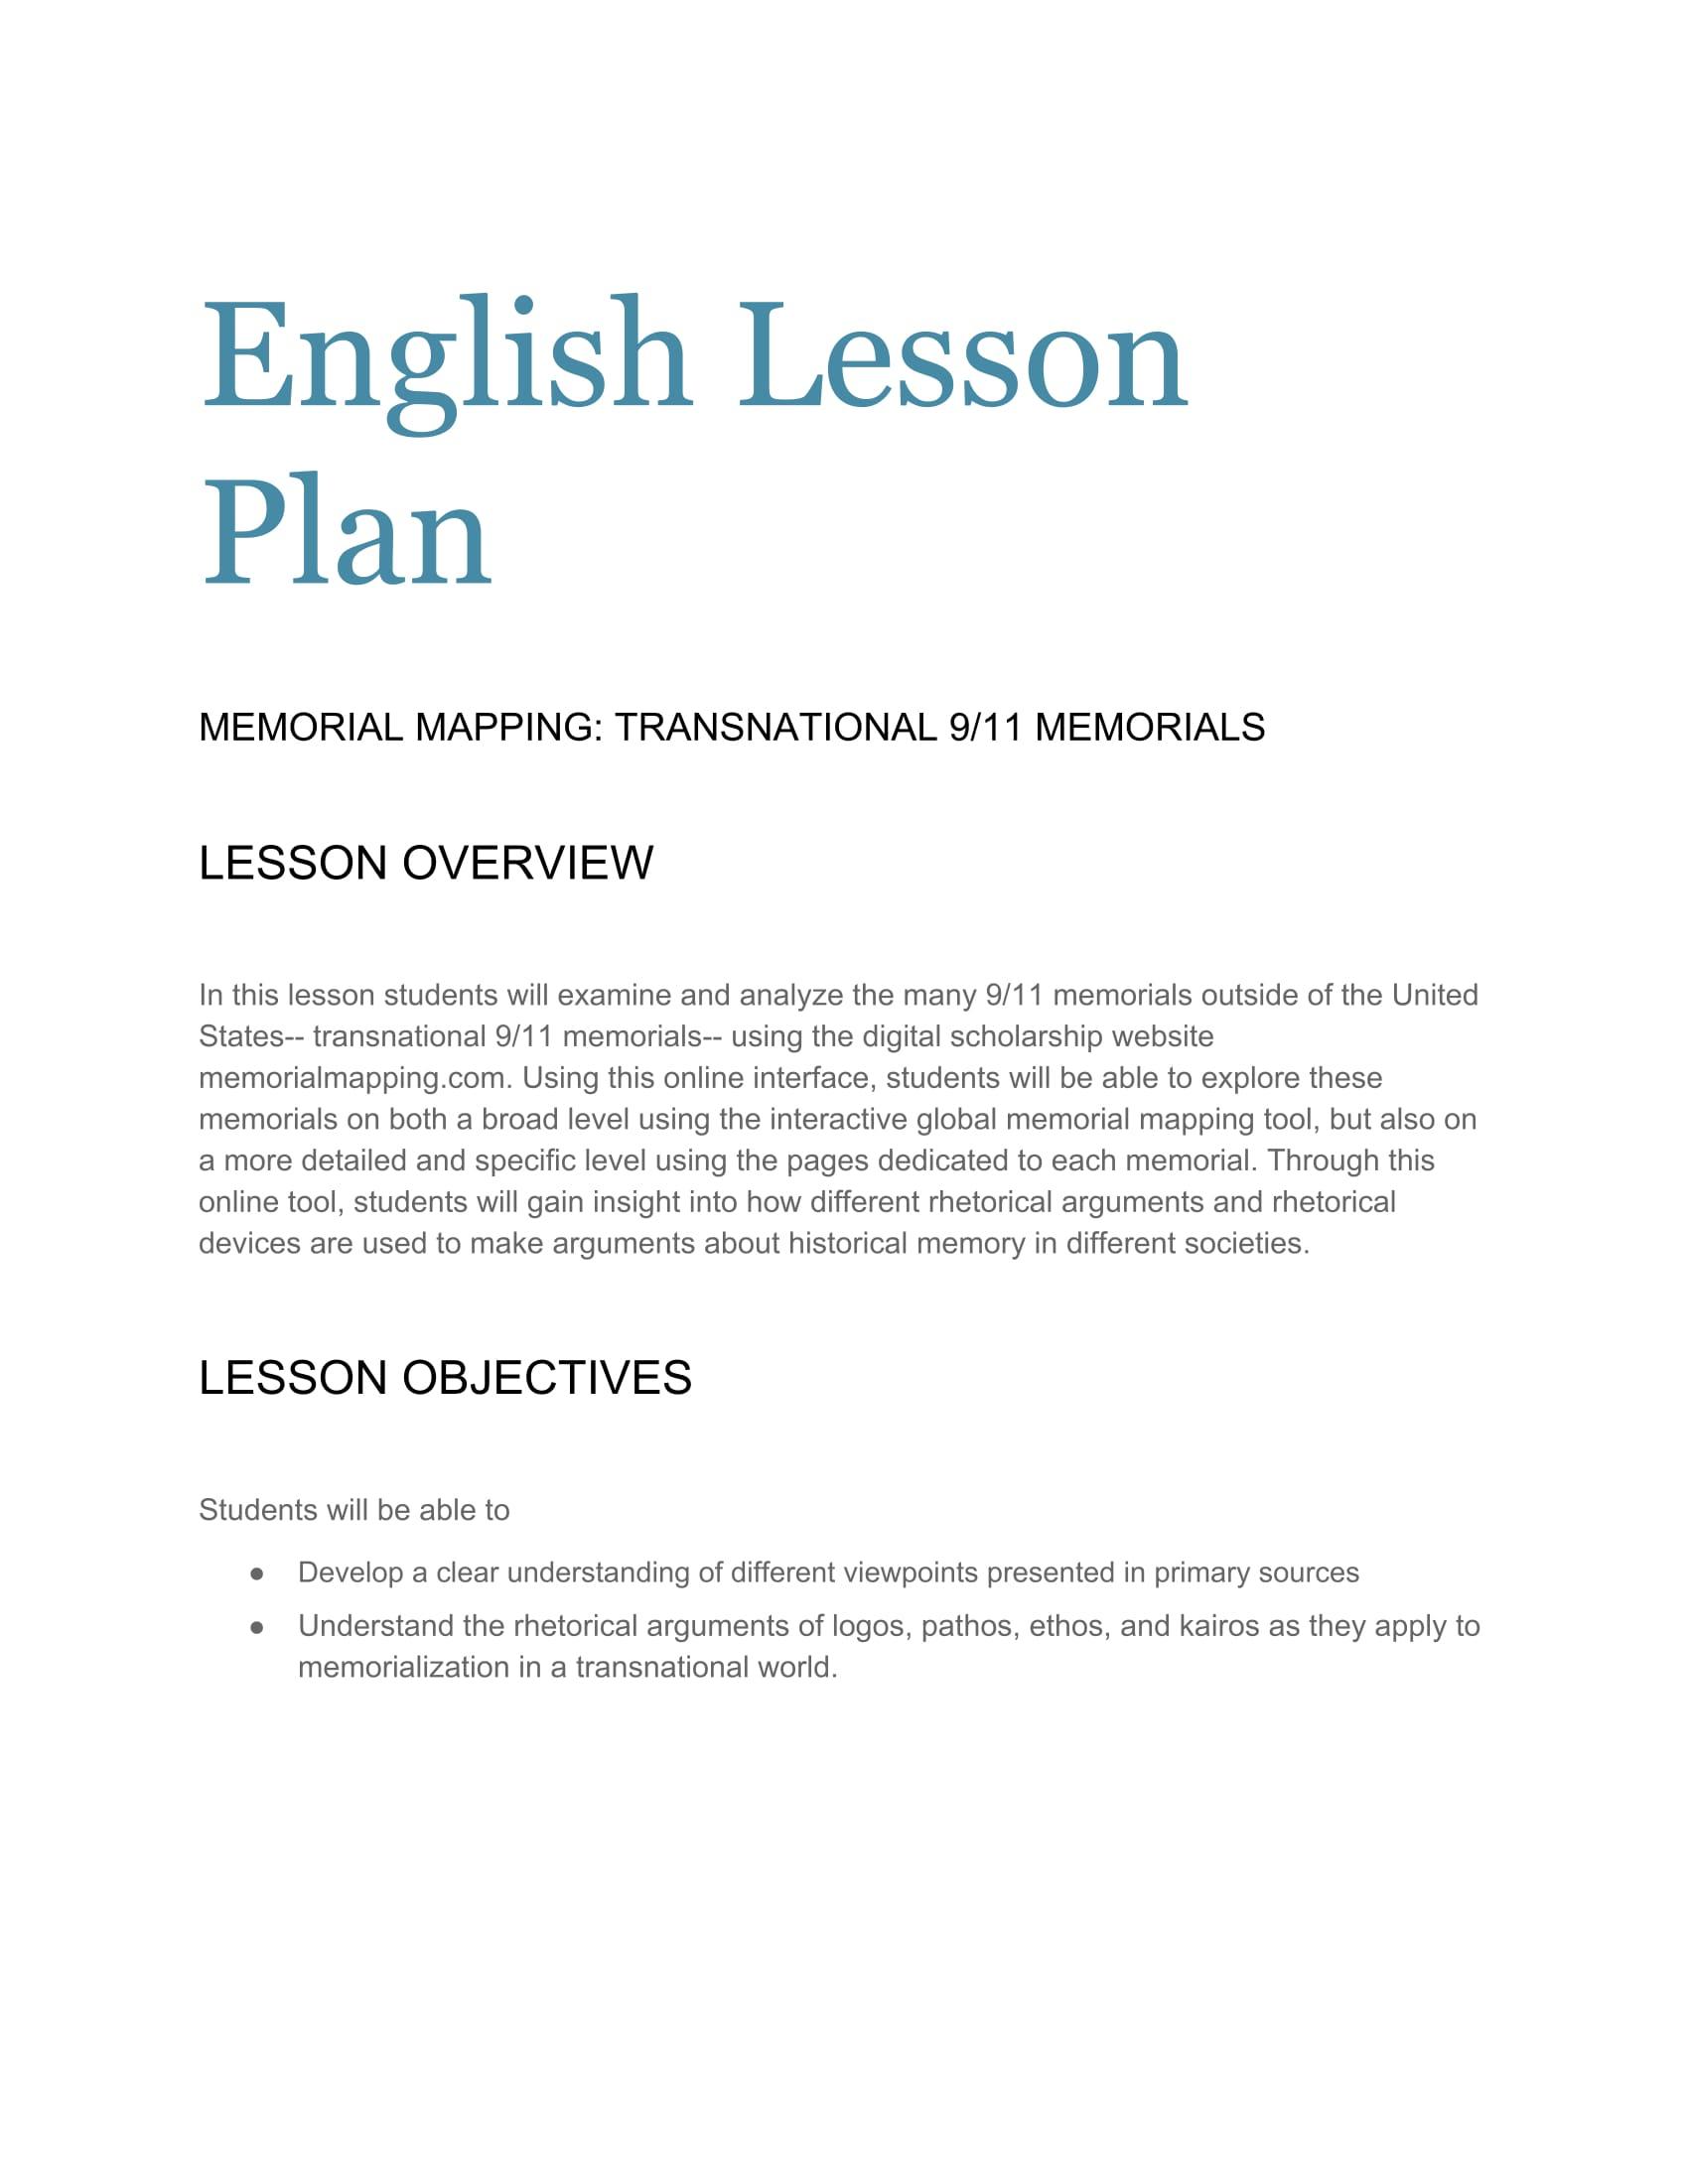 English Lesson Plan Final-1.jpg